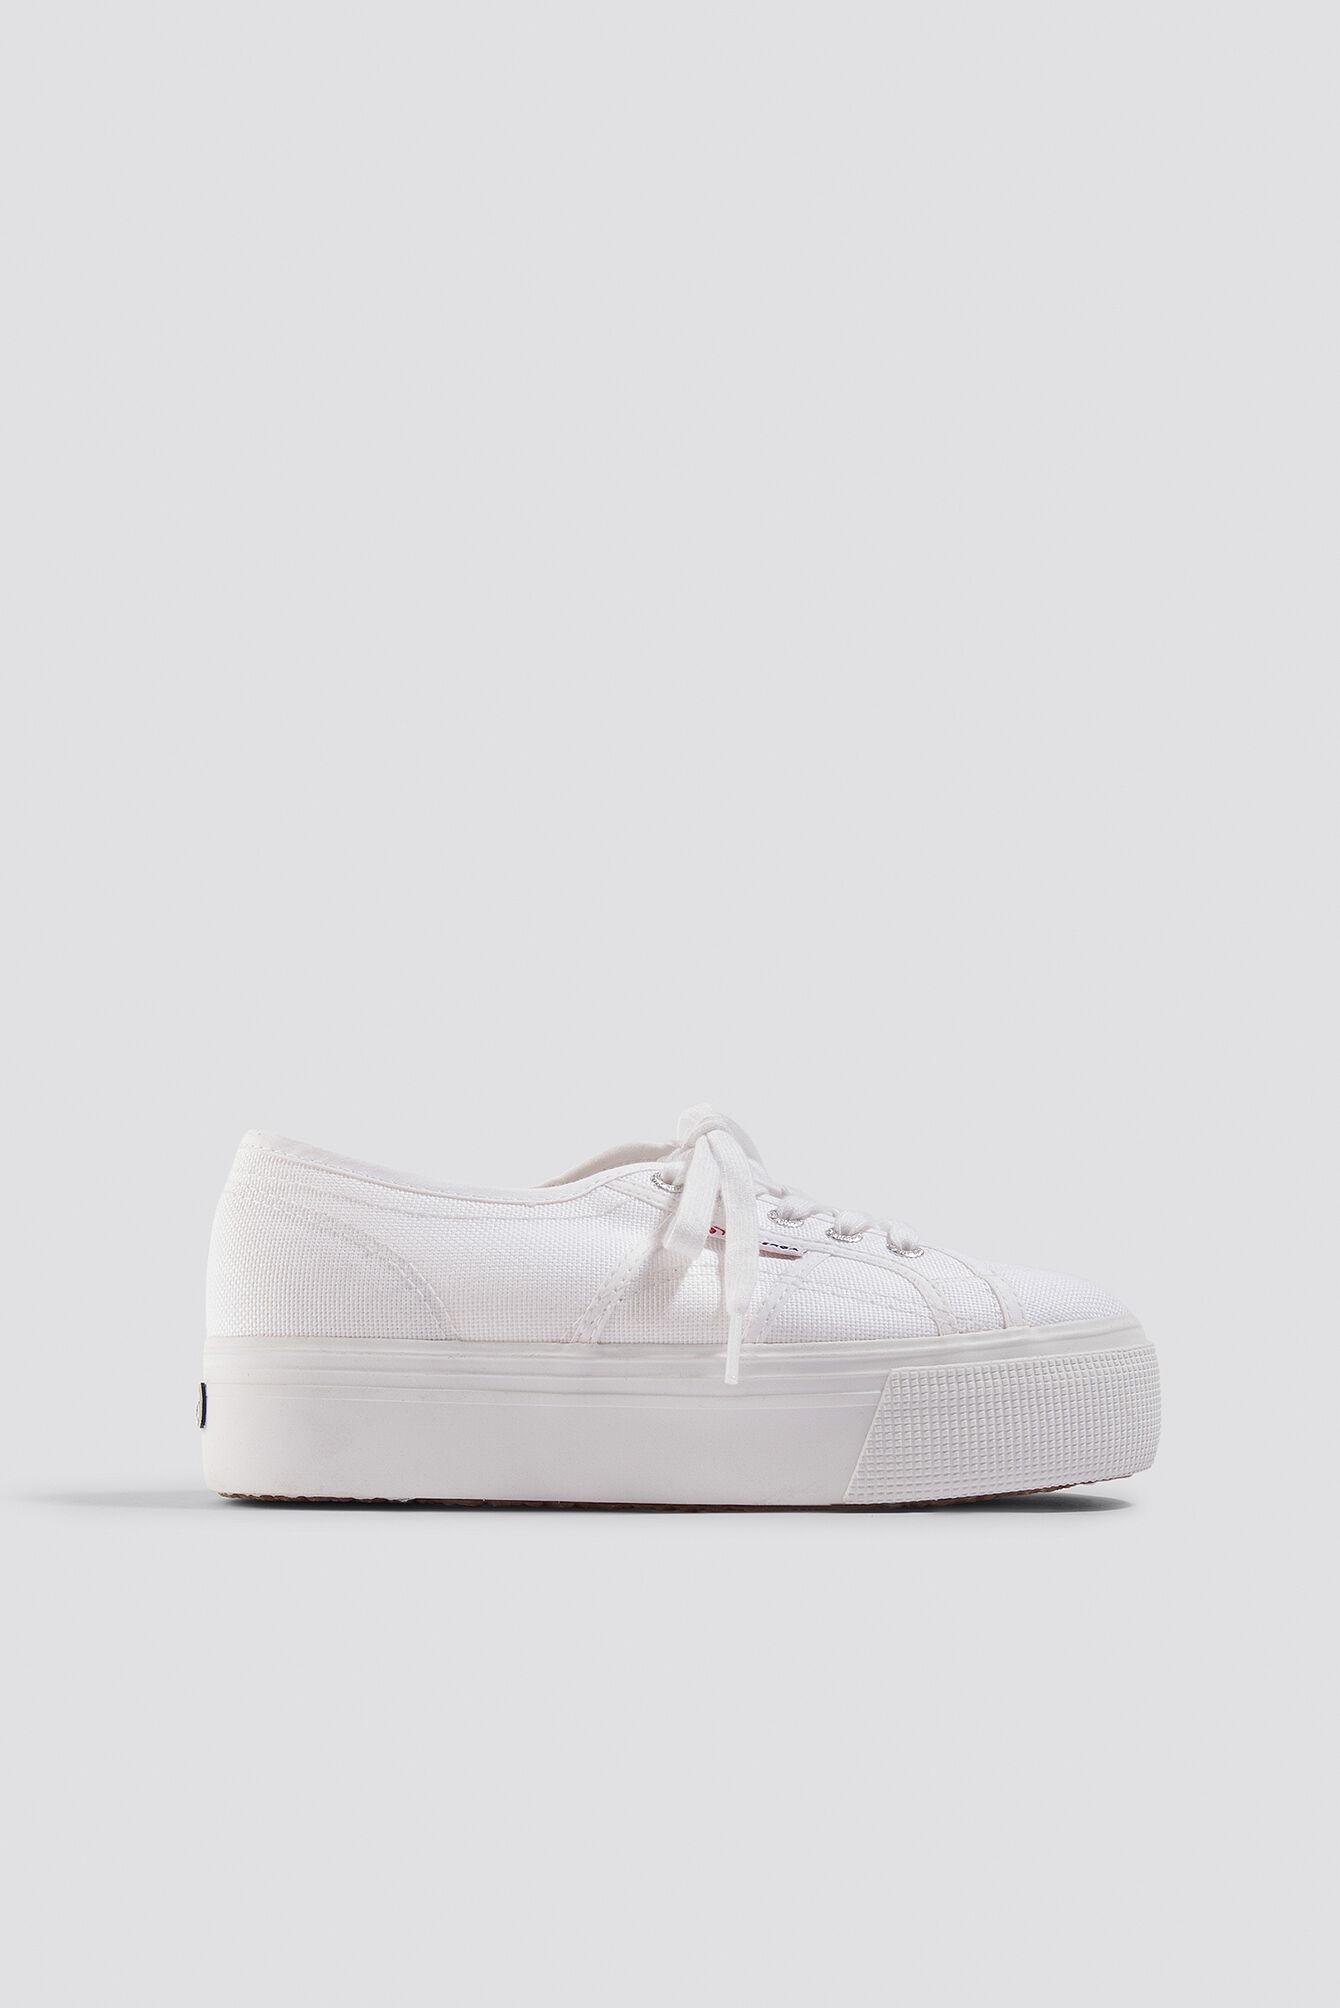 Superga Acotw Linea 2790 - White